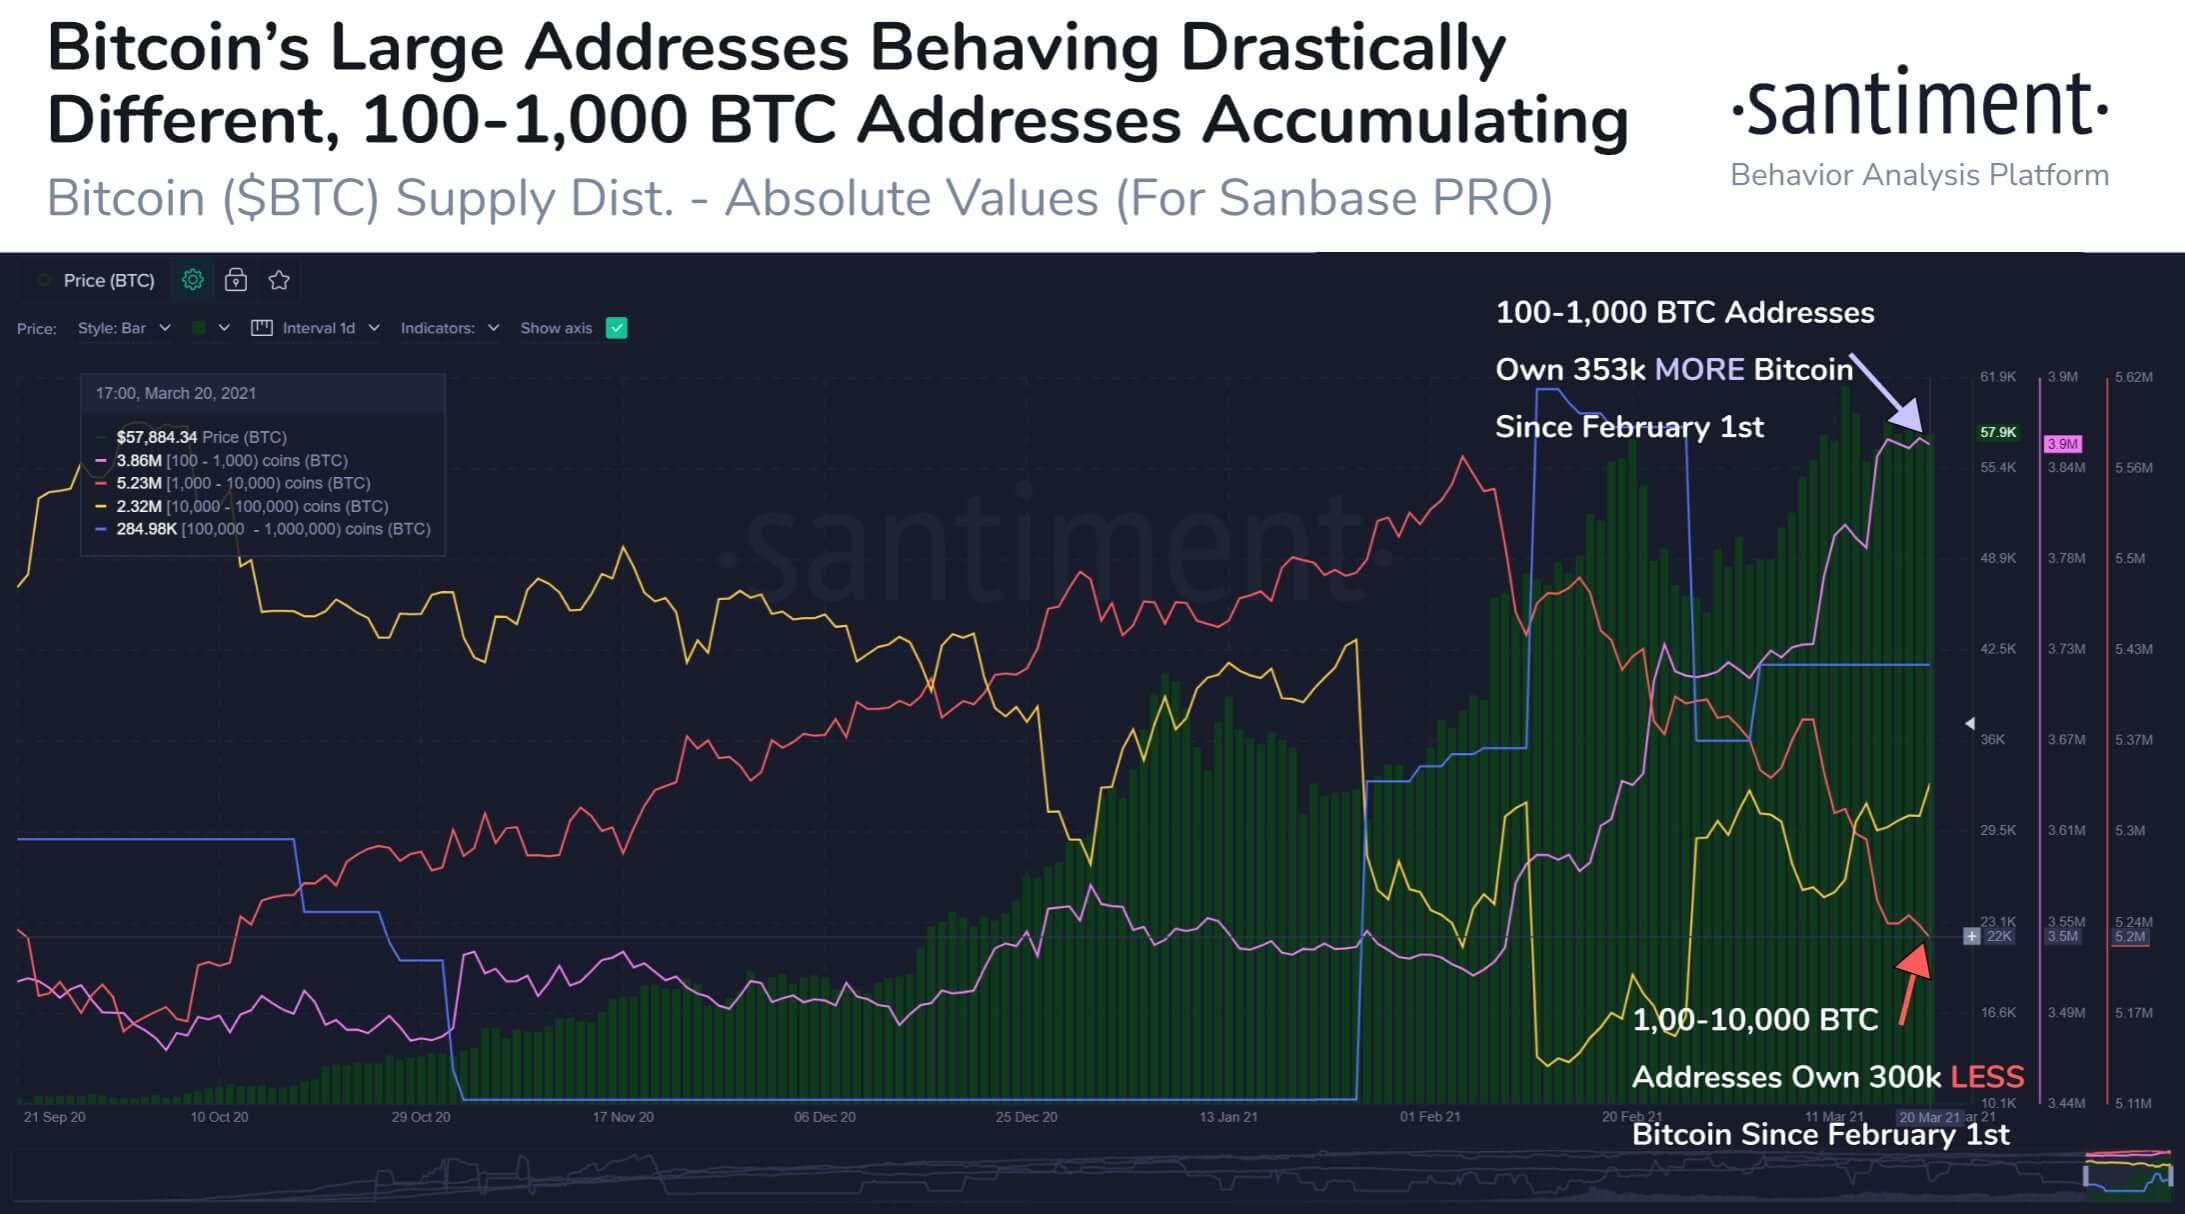 график криптовалюты трейдинг